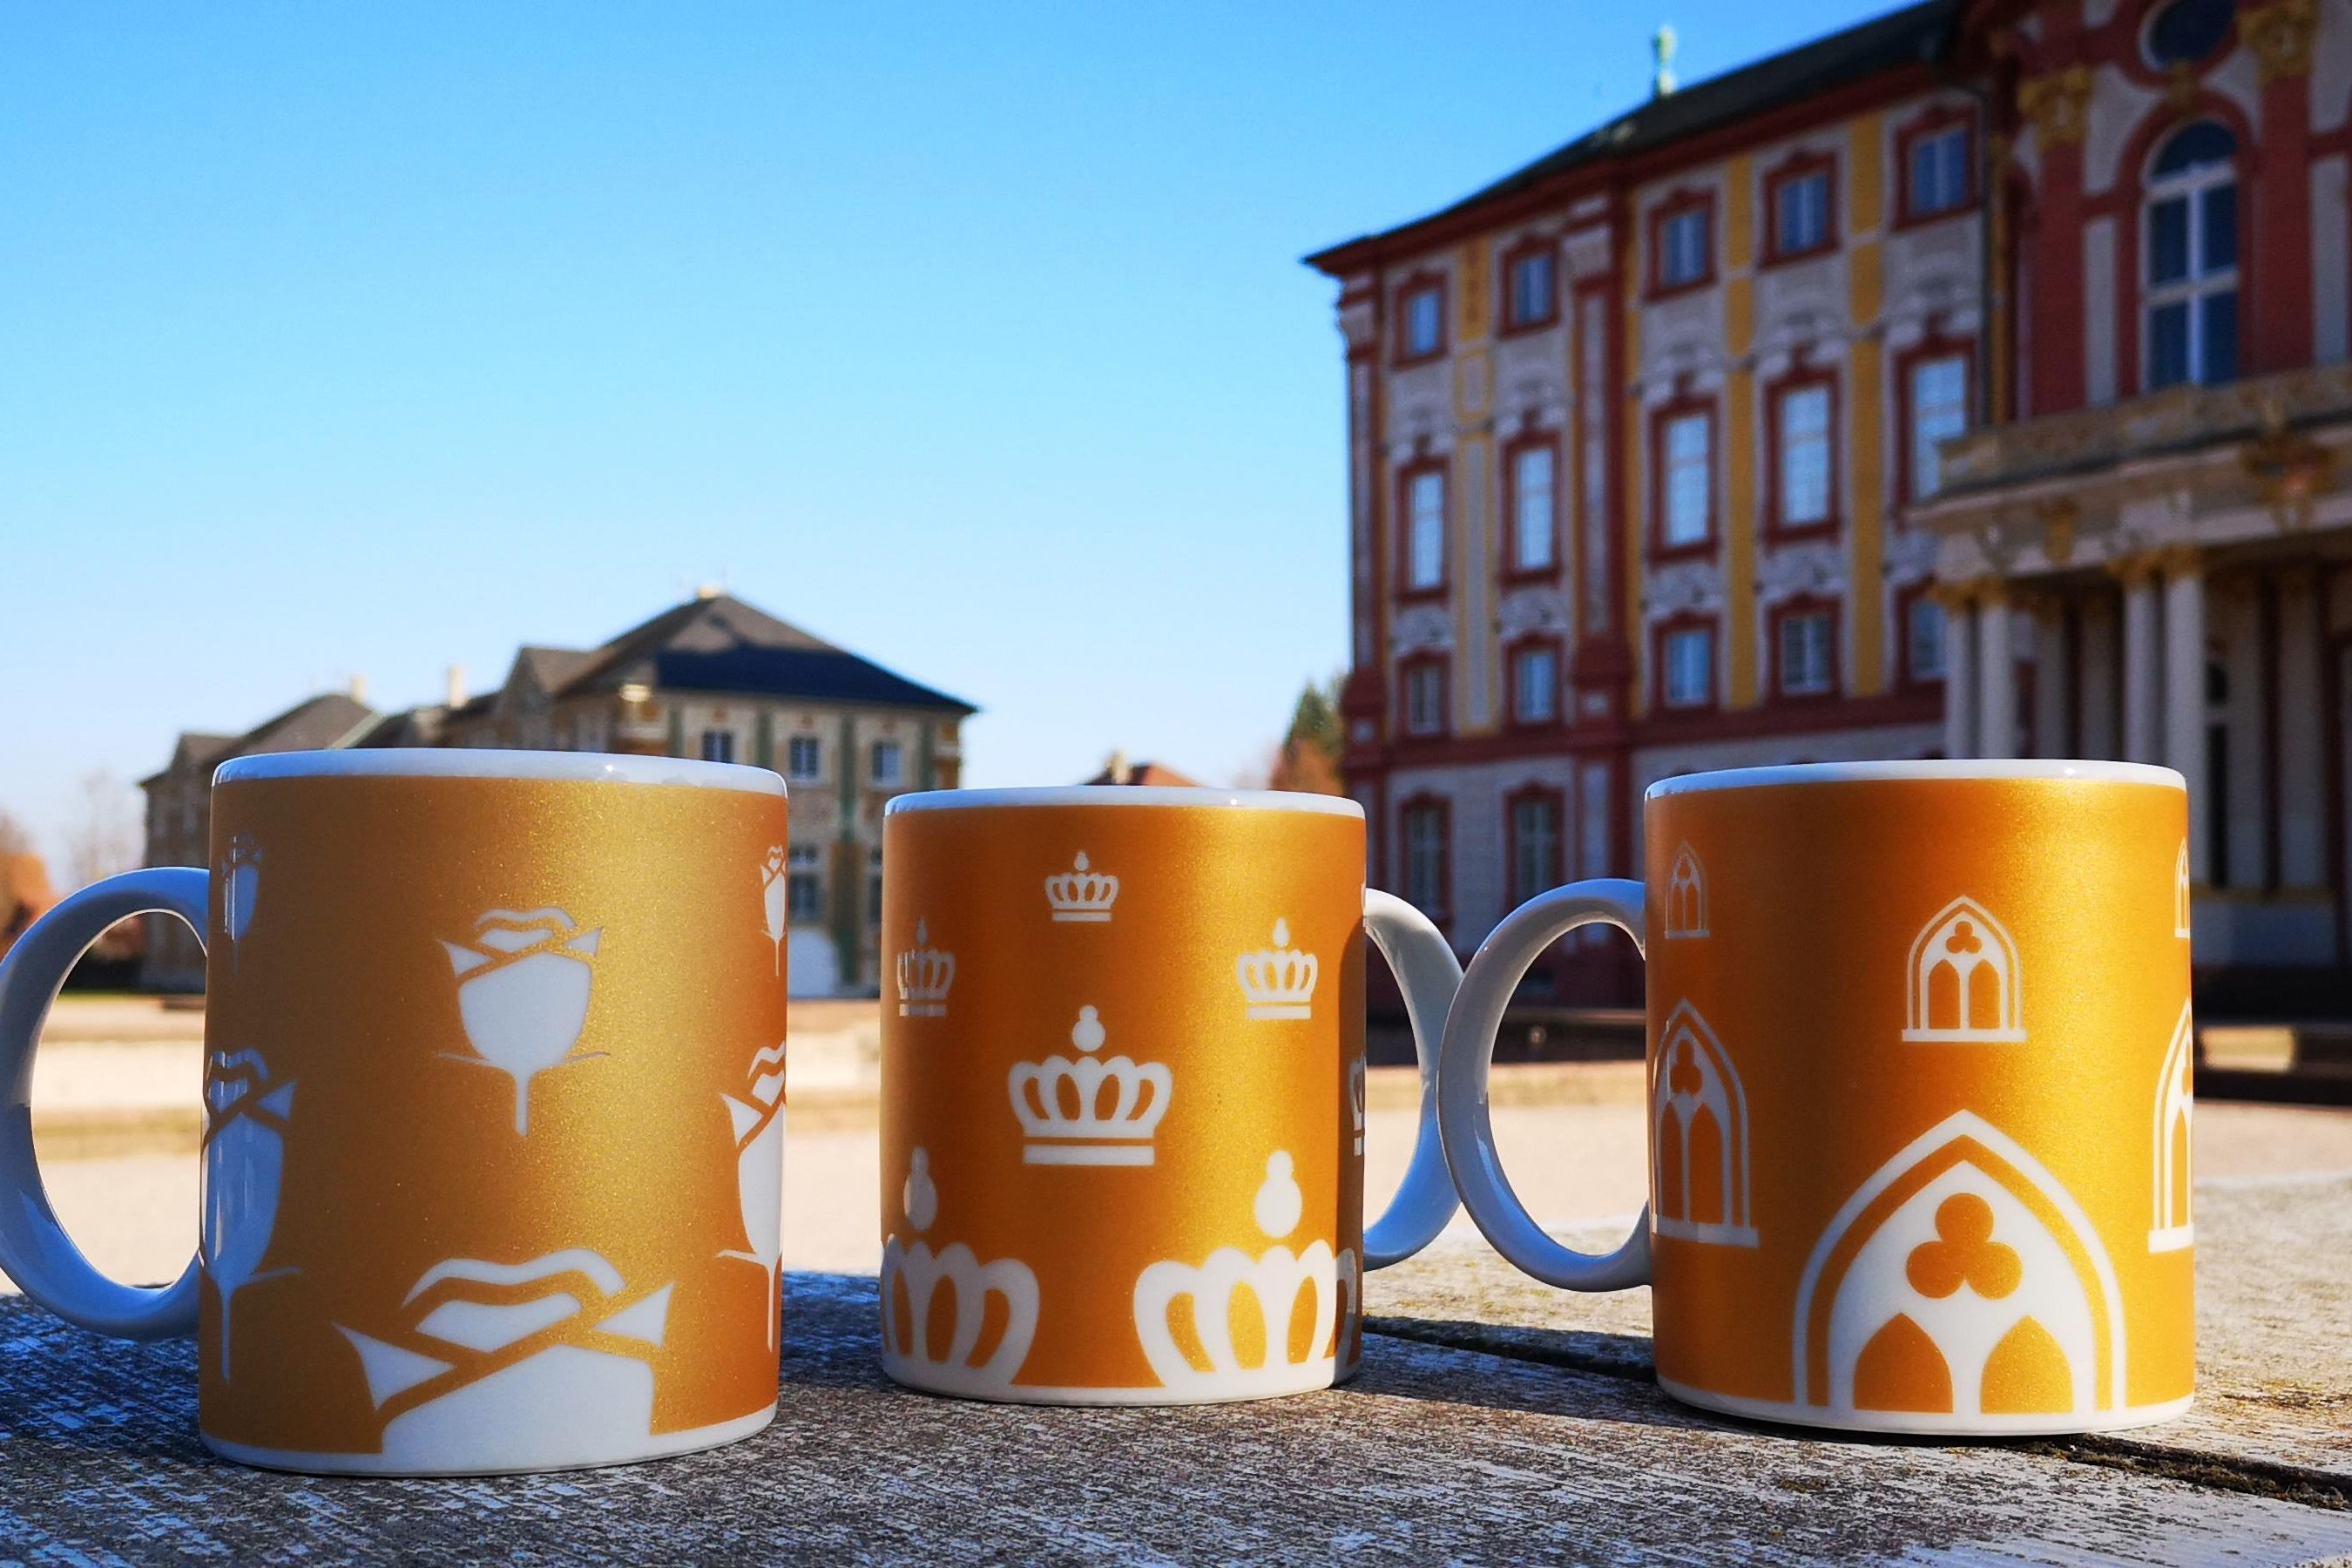 Drei Tassen vor Schloss Bruchsal